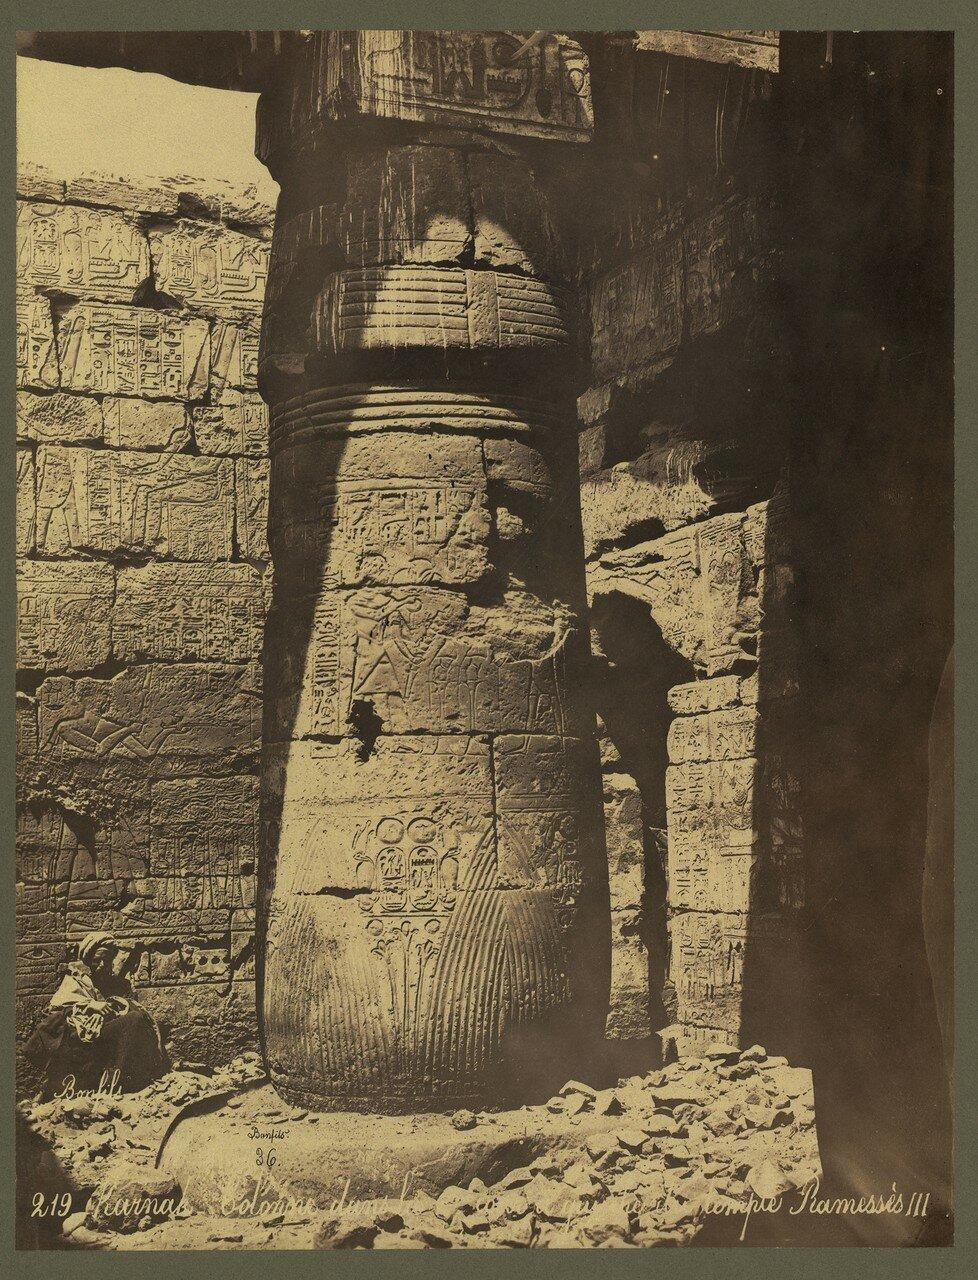 Карнак (Фивы). Колонна храма Рамсеса III. 1867